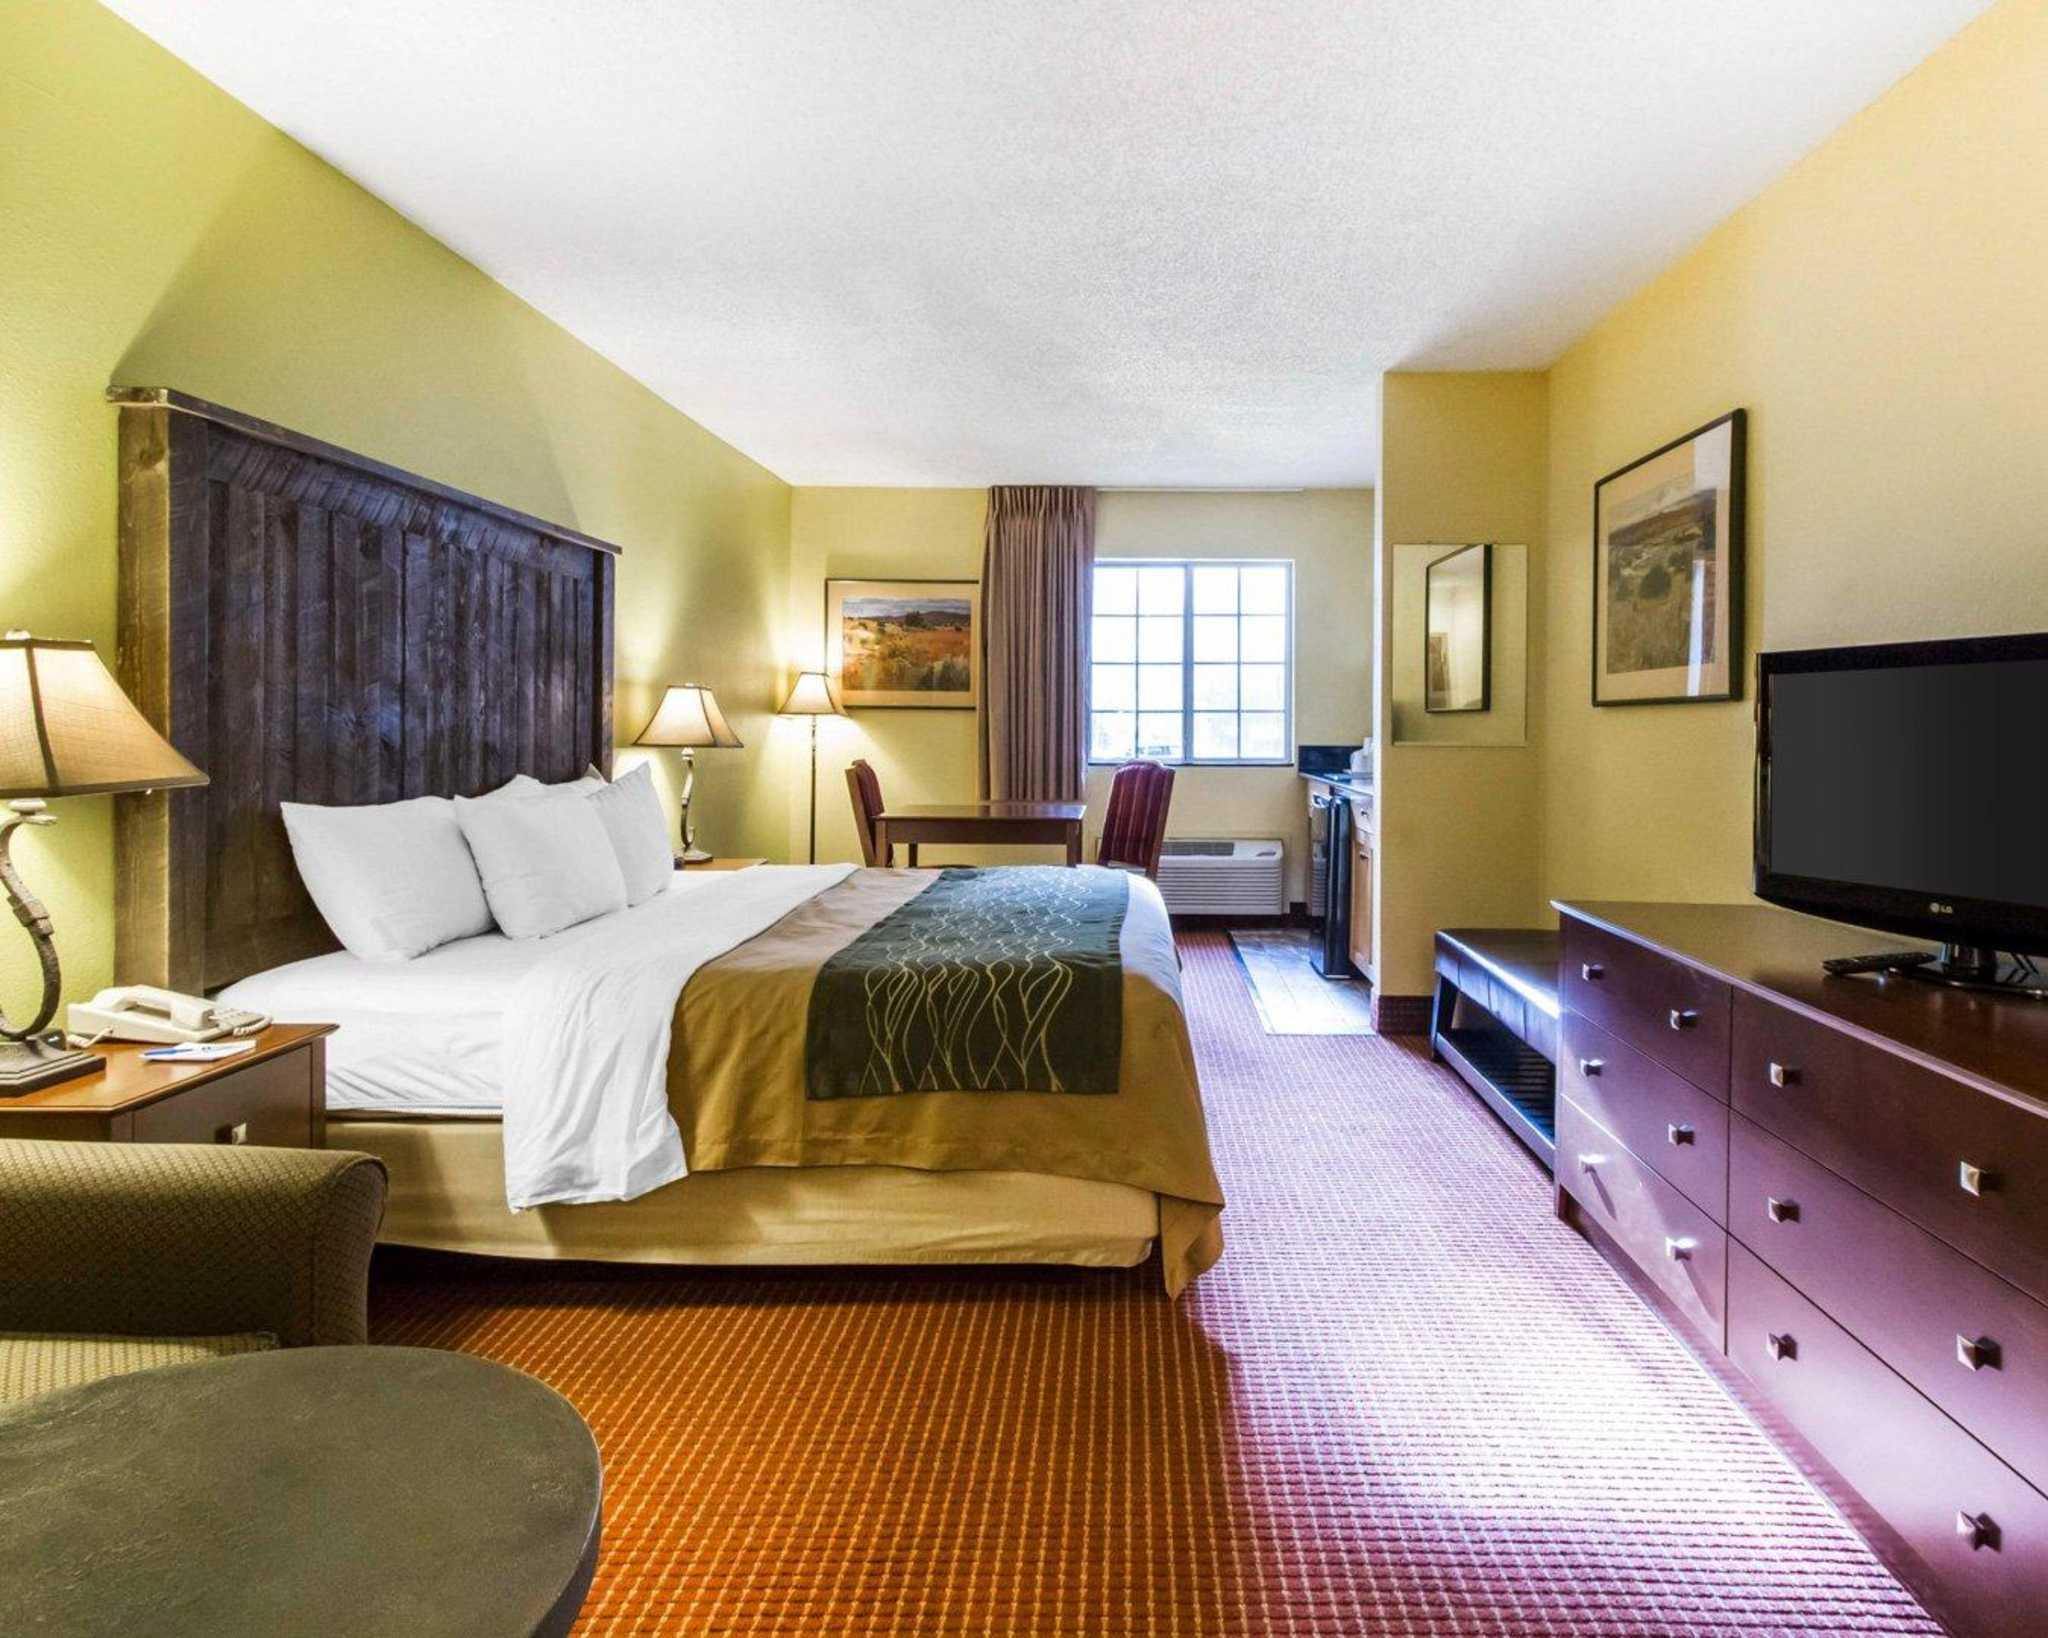 Comfort Inn I-17 & I-40 image 19